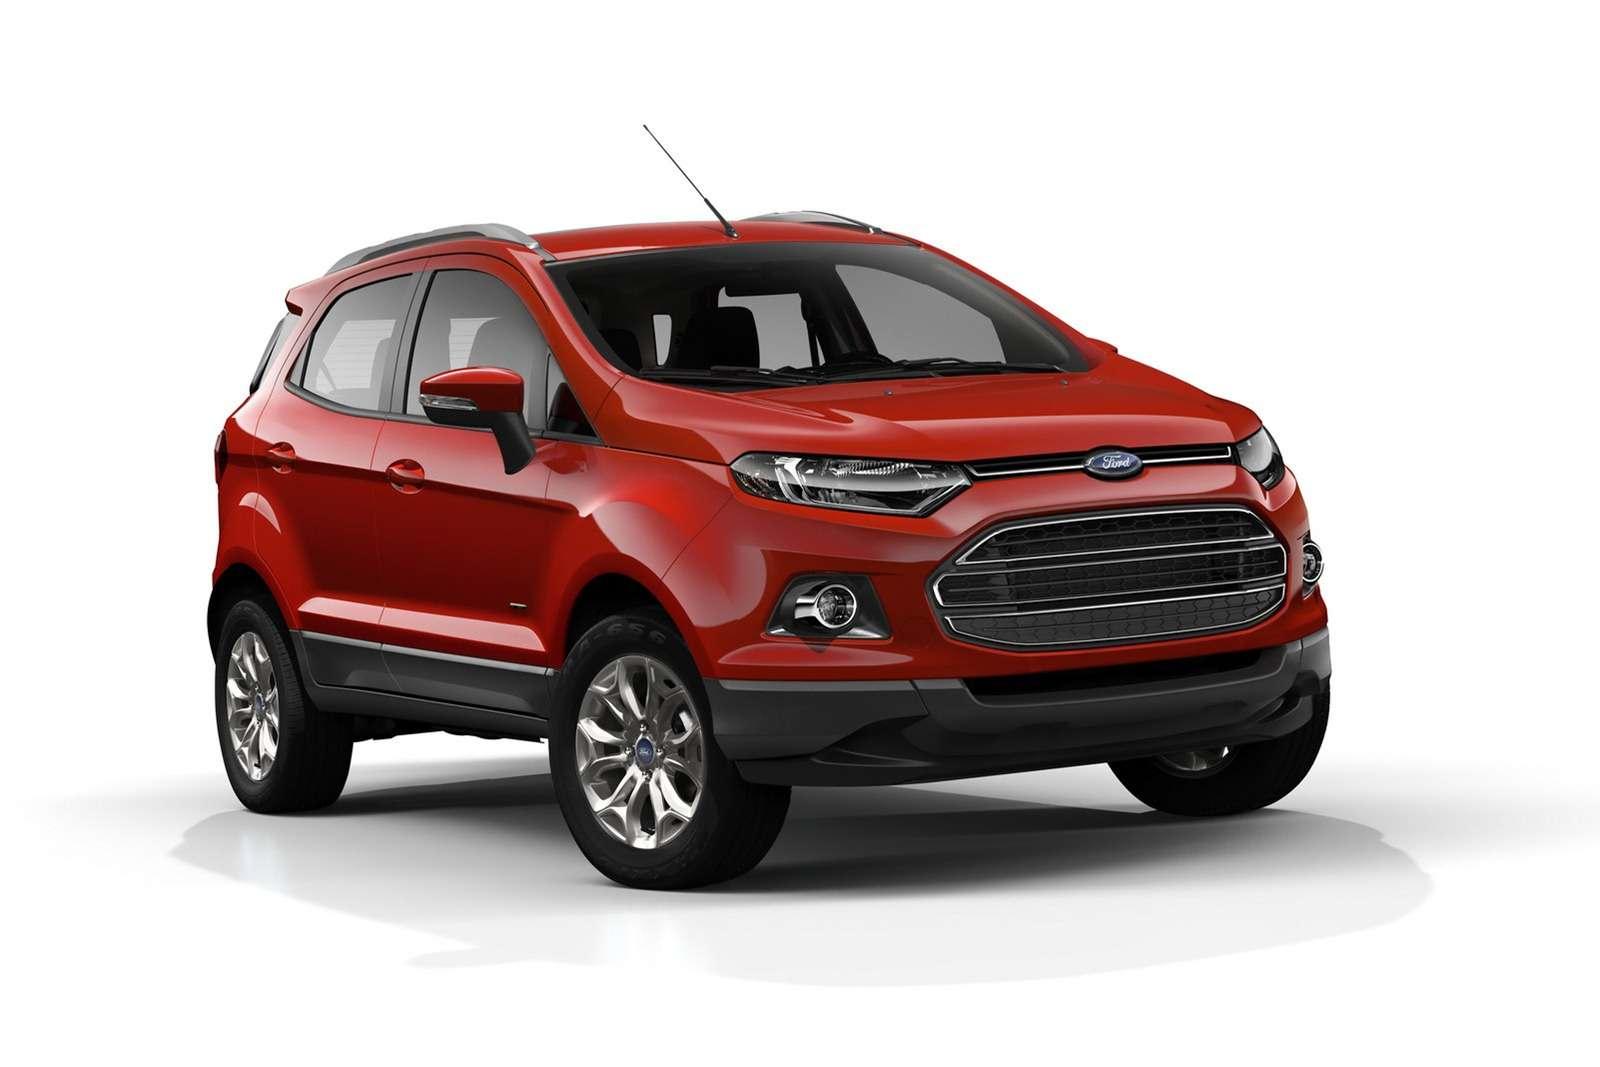 Ford Ecosport Deals